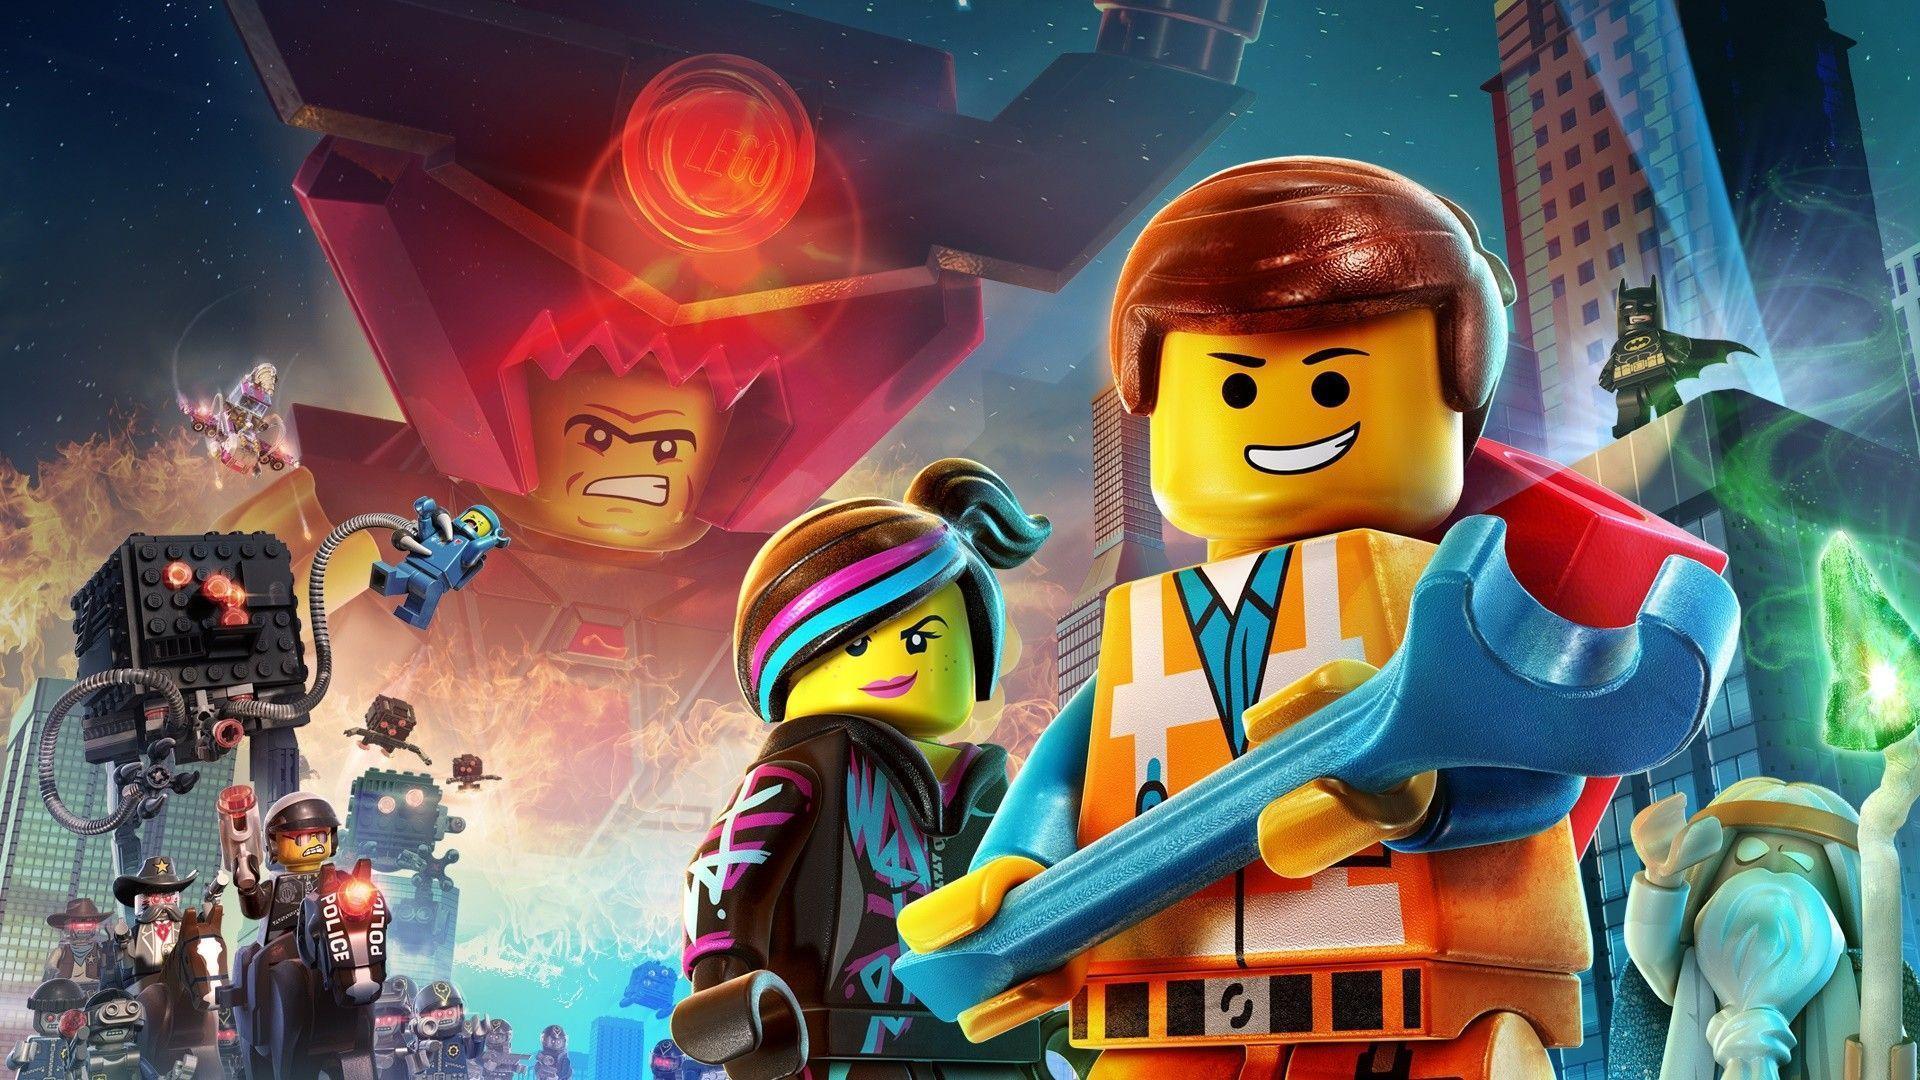 HD The LEGO NINJAGO Movie Wallpaper